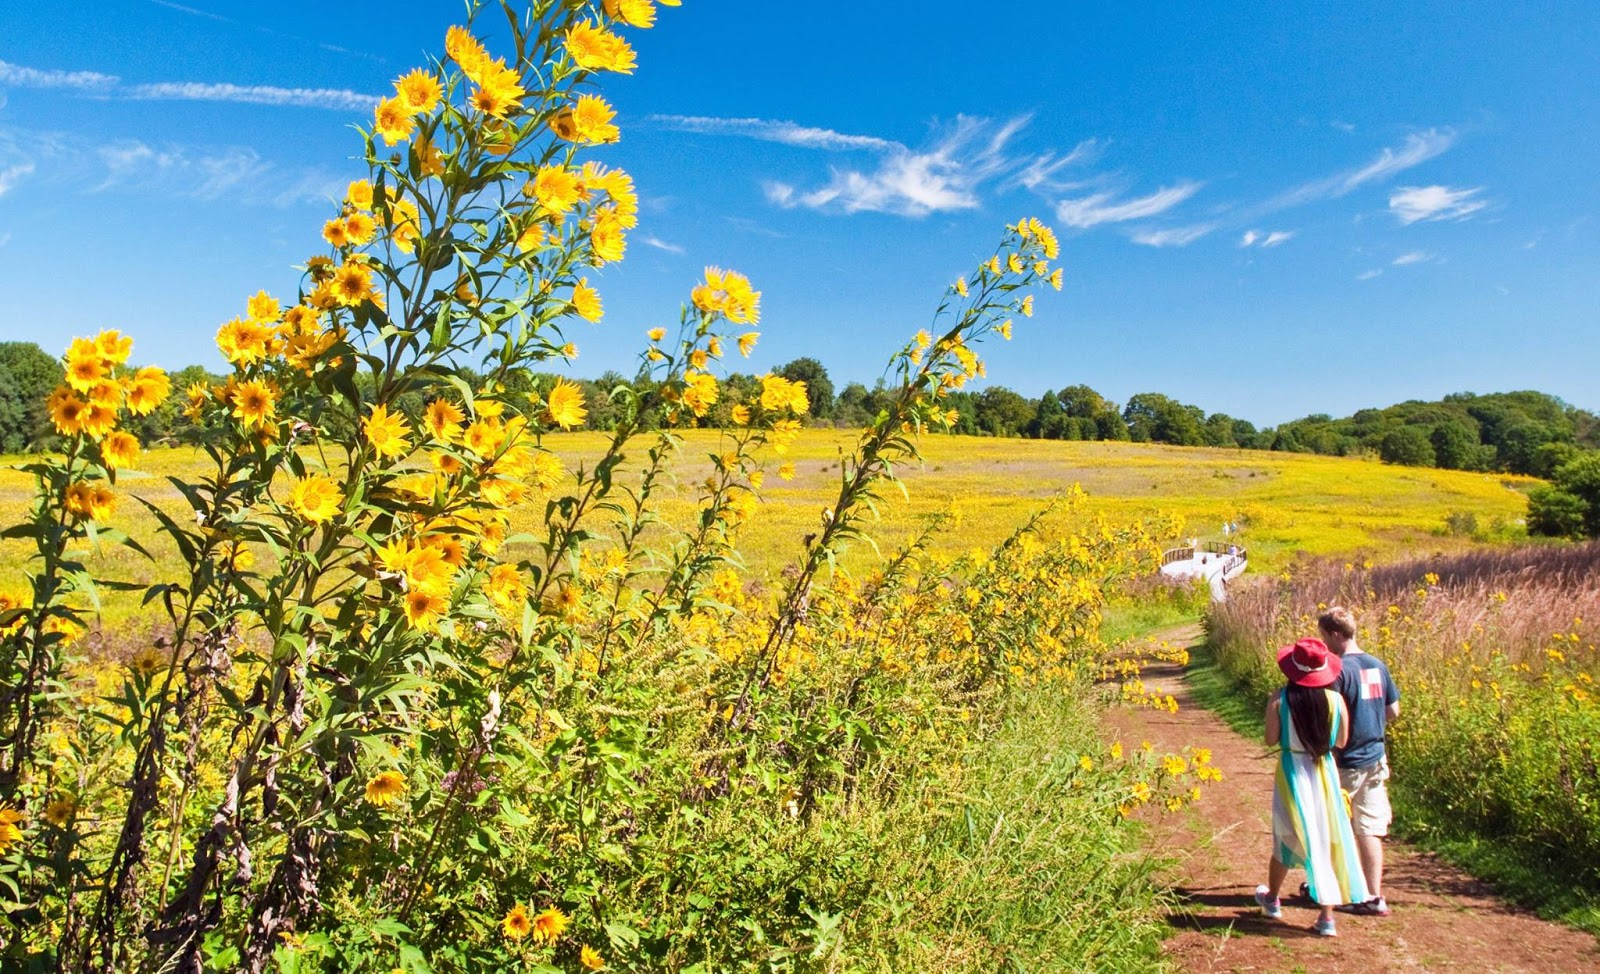 Paseo entre flores silvestres en las praderas (Meadow Garden) en Longwood Gardens